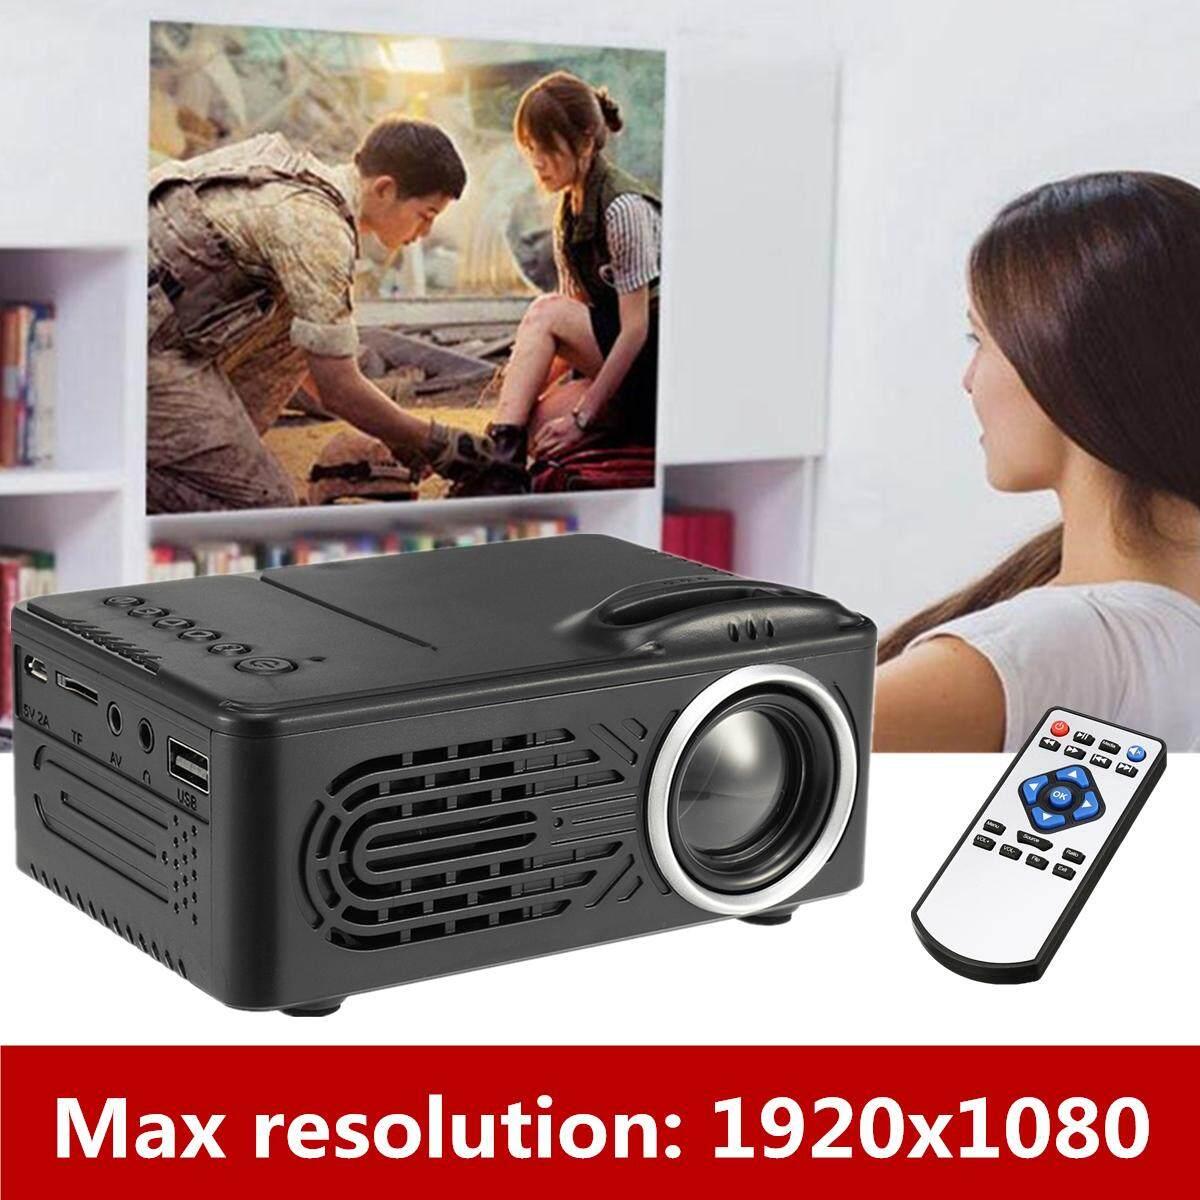 My Chiu Phn Gii Cao Tch Hp Wifi Gi Tt Unic Mini Led Projector Uc28 400 Lumens Proyektor Portable Uc 28 Plus 6000 Multimedia 1080p Hd Video Hdmi Usb Home Cinema